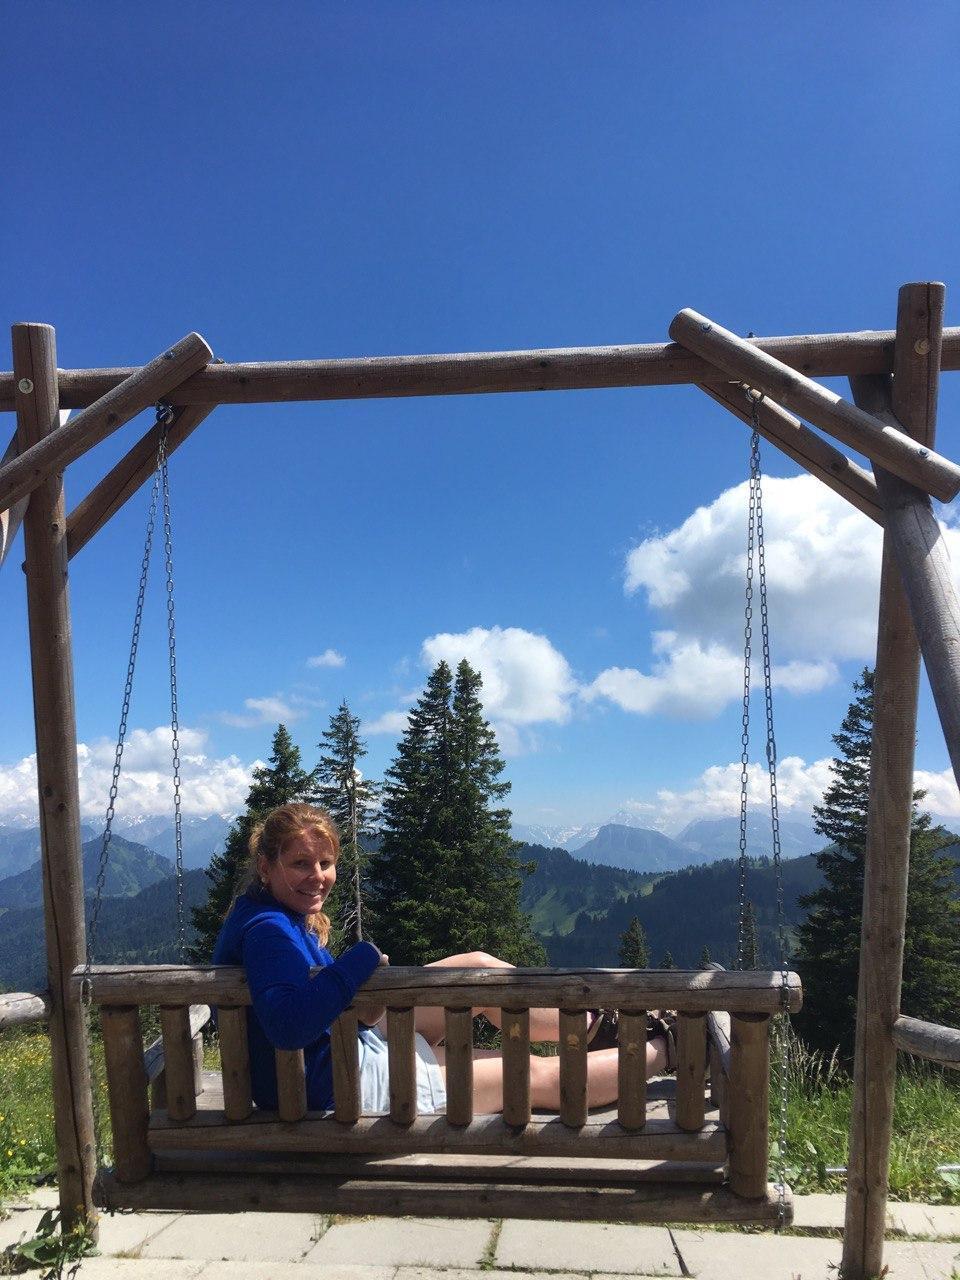 Mountain swing